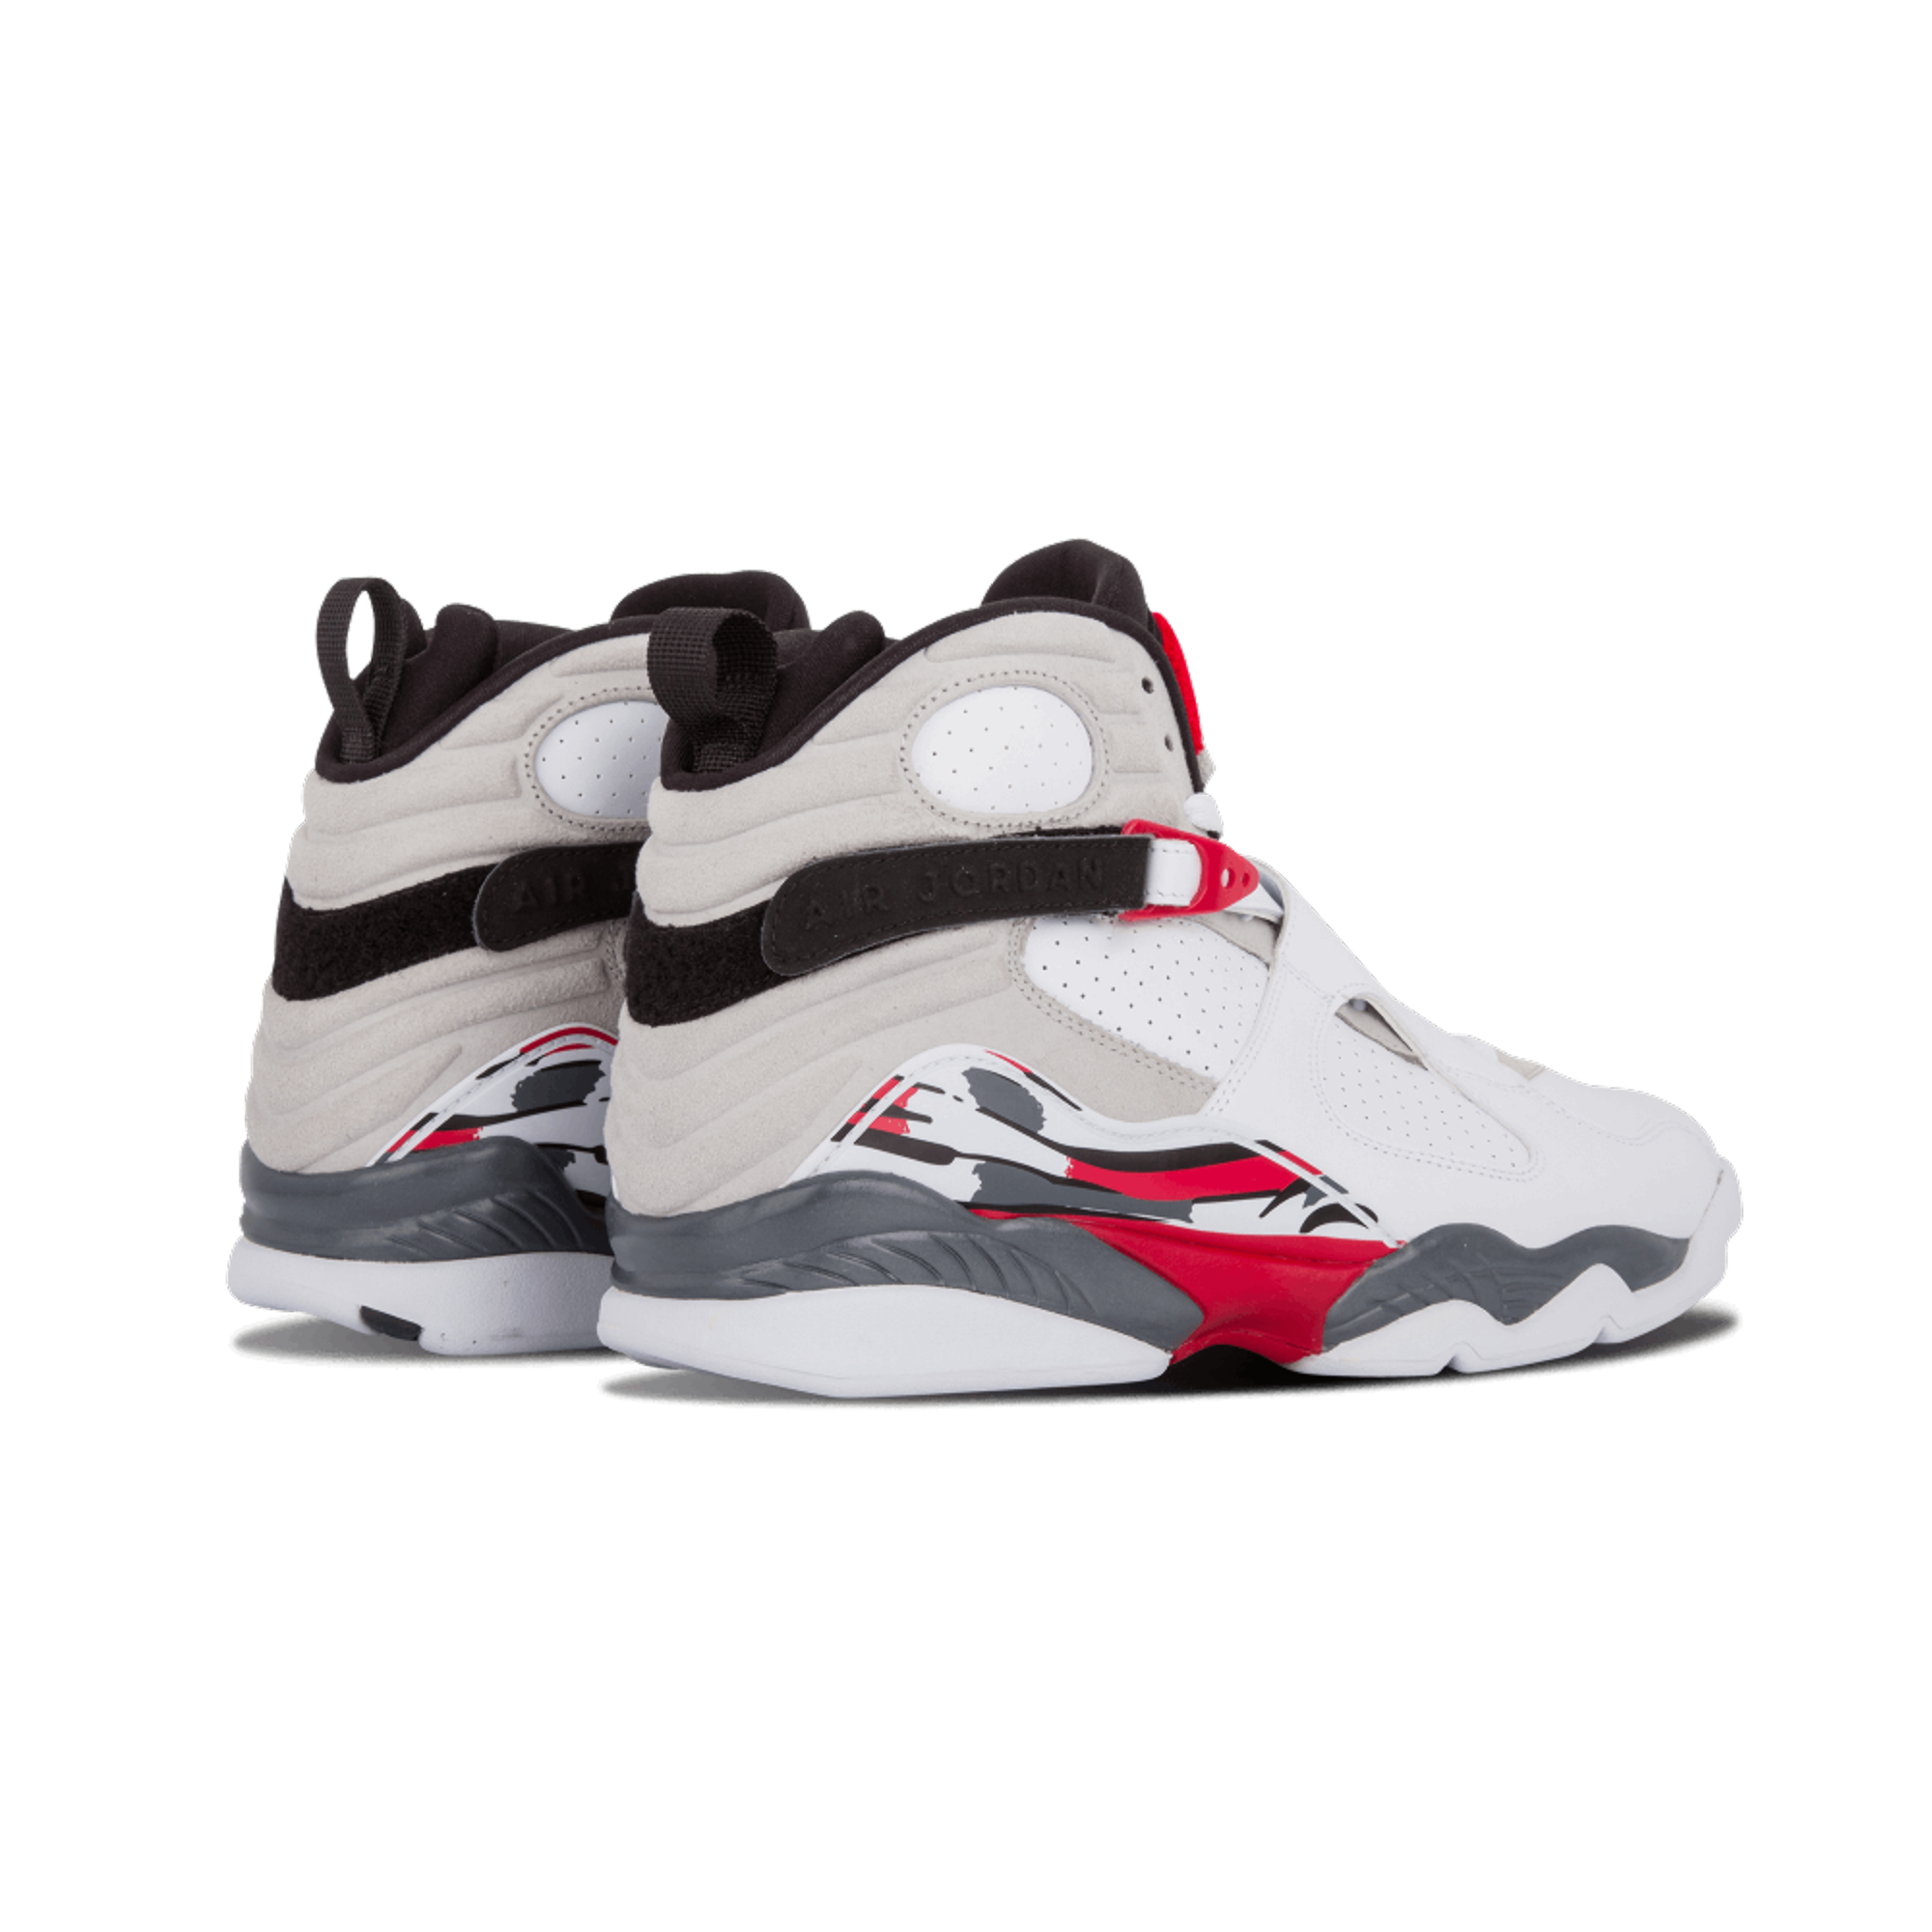 reputable site e5c9c 6010d Air Jordan - Men - Air Jordan 8 Retro  Bugs Bunny  -305381-103 - Size 10.5  - Size 10.5   Walmart Canada